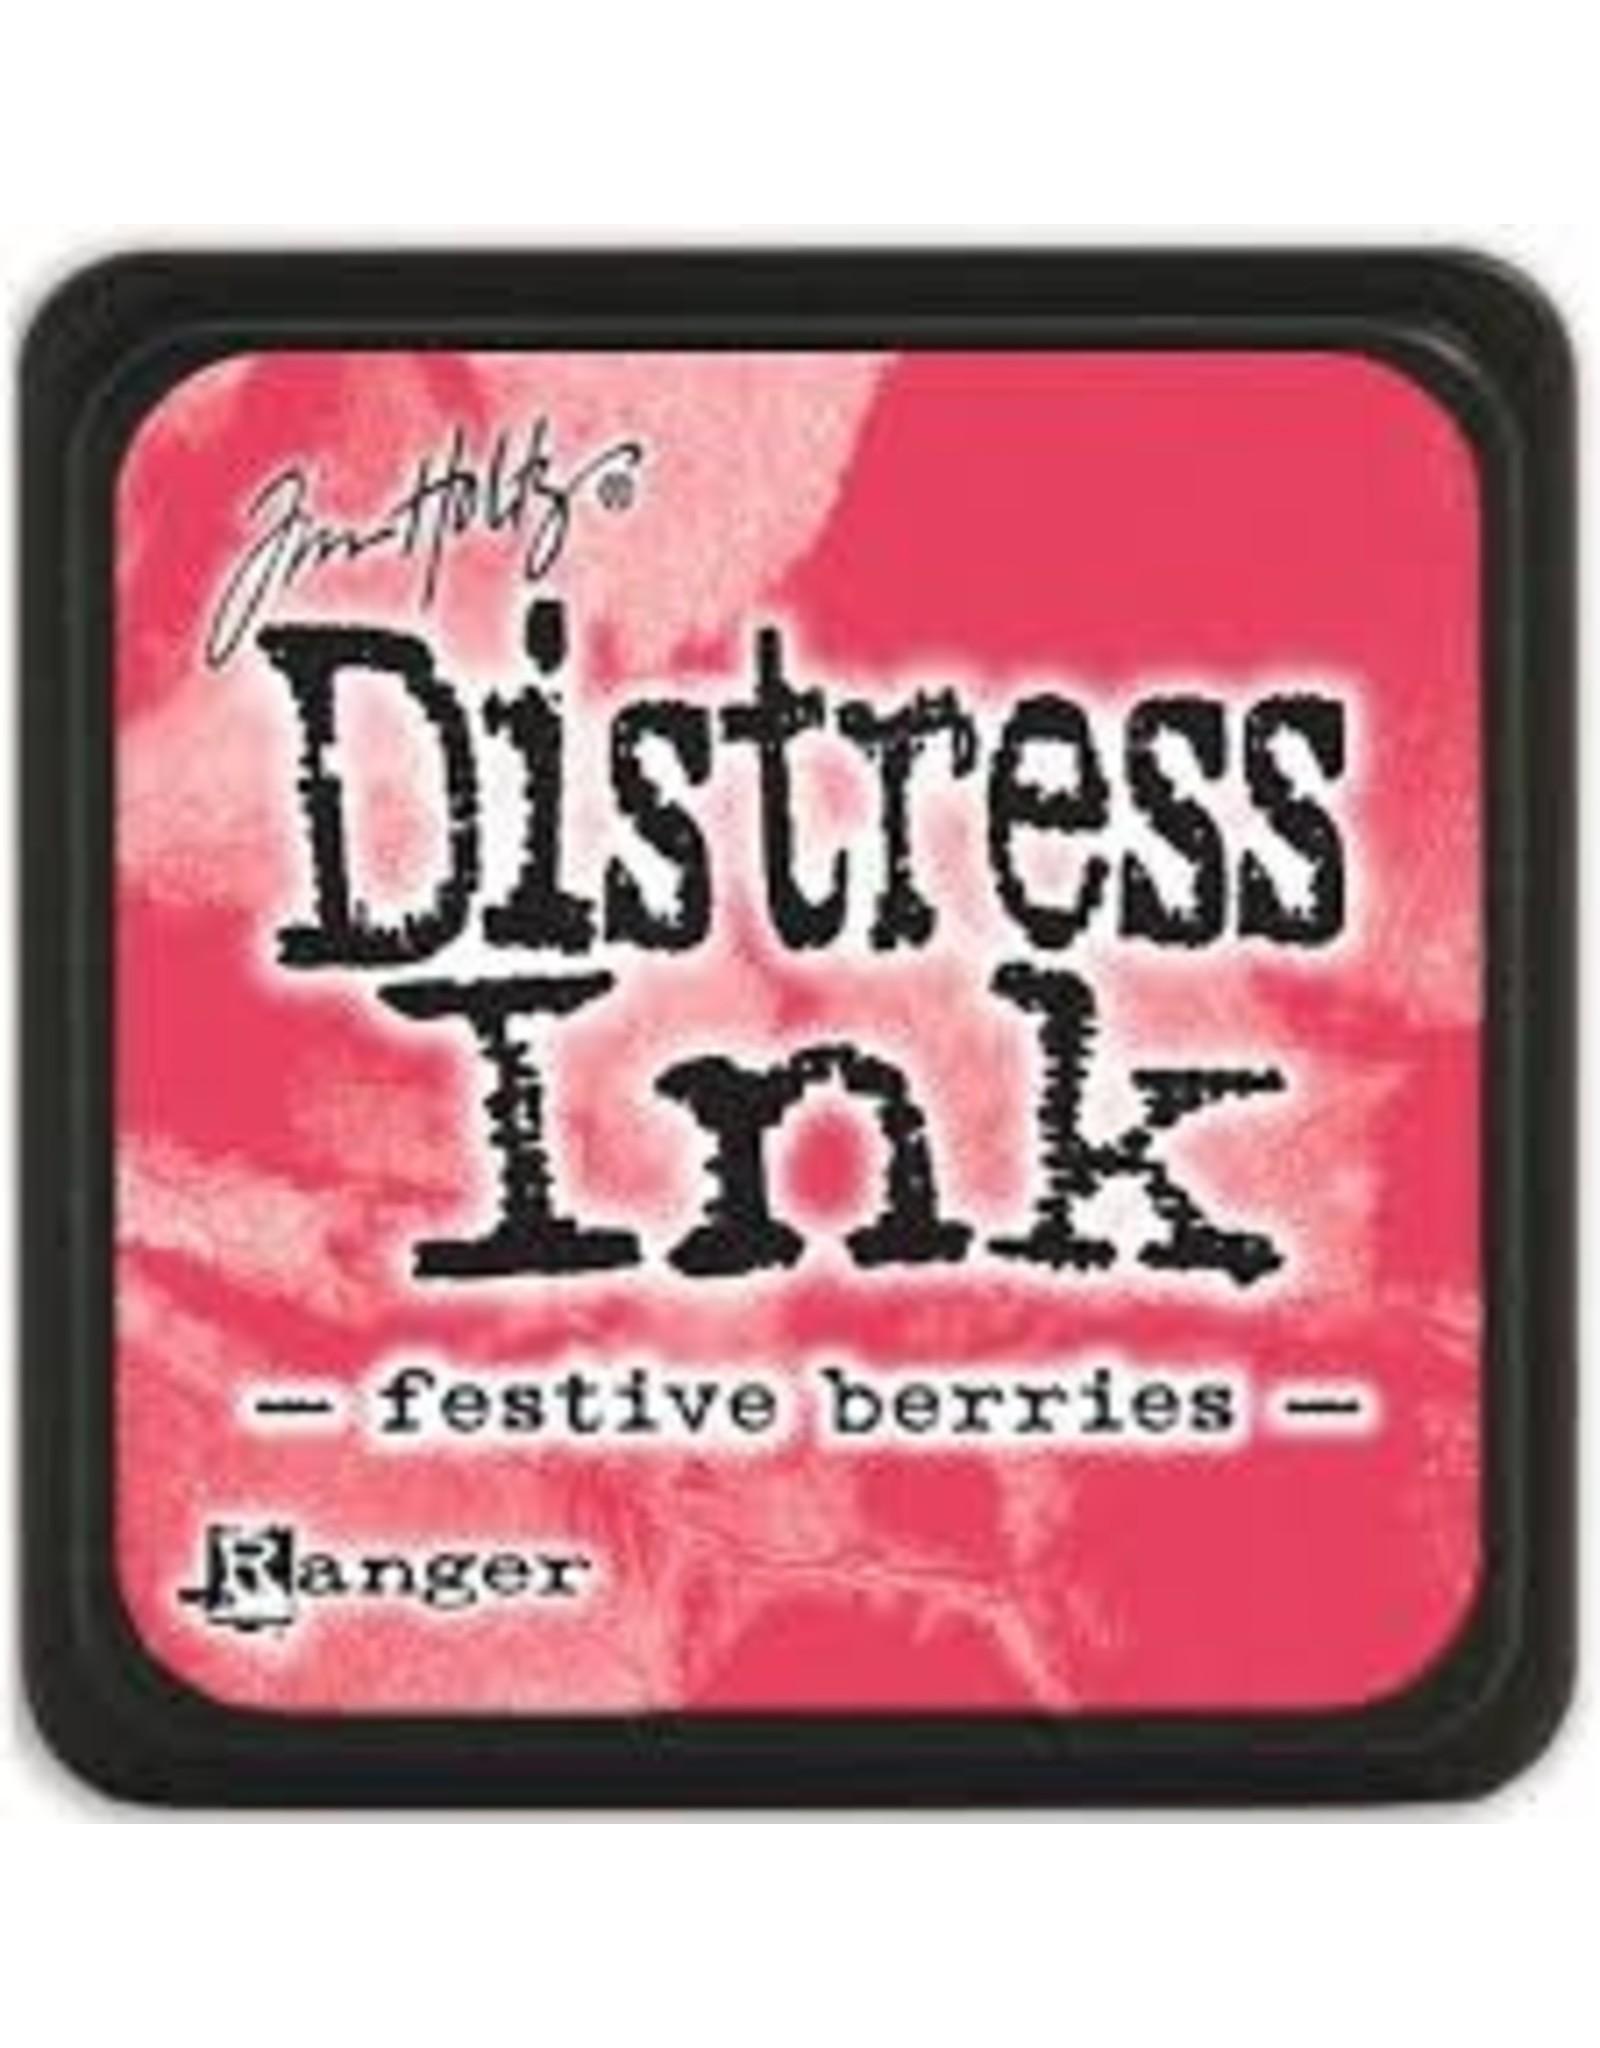 Ranger Distress Ink Pad - Festive Berries